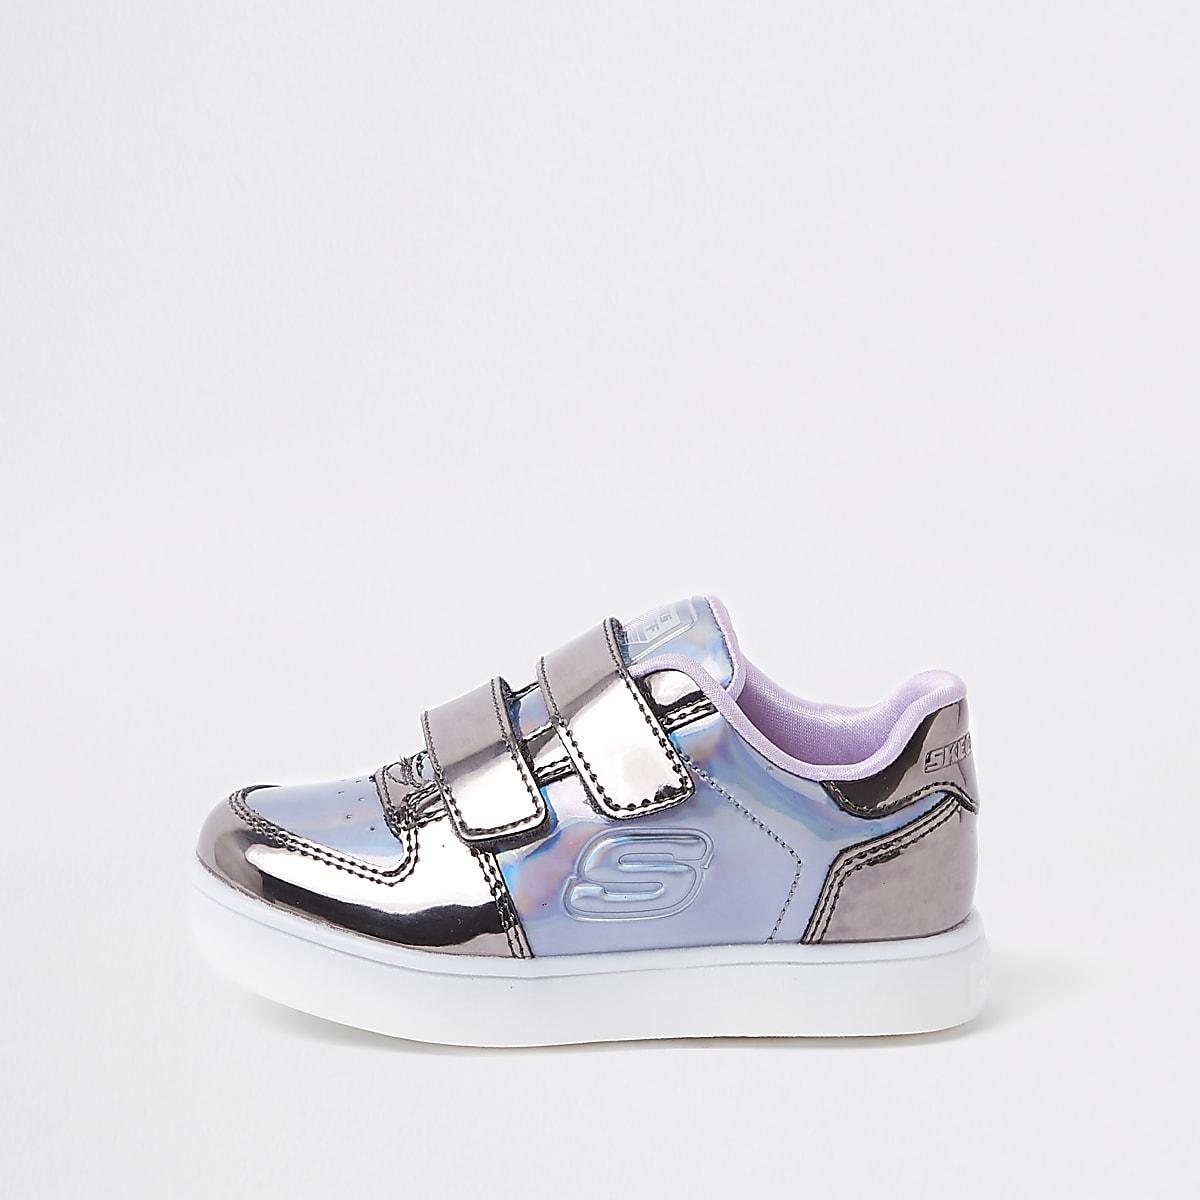 524f58fb010 Skechers – Baskets lumineuses violettes mini fille Skechers – Baskets  lumineuses violettes mini fille ...